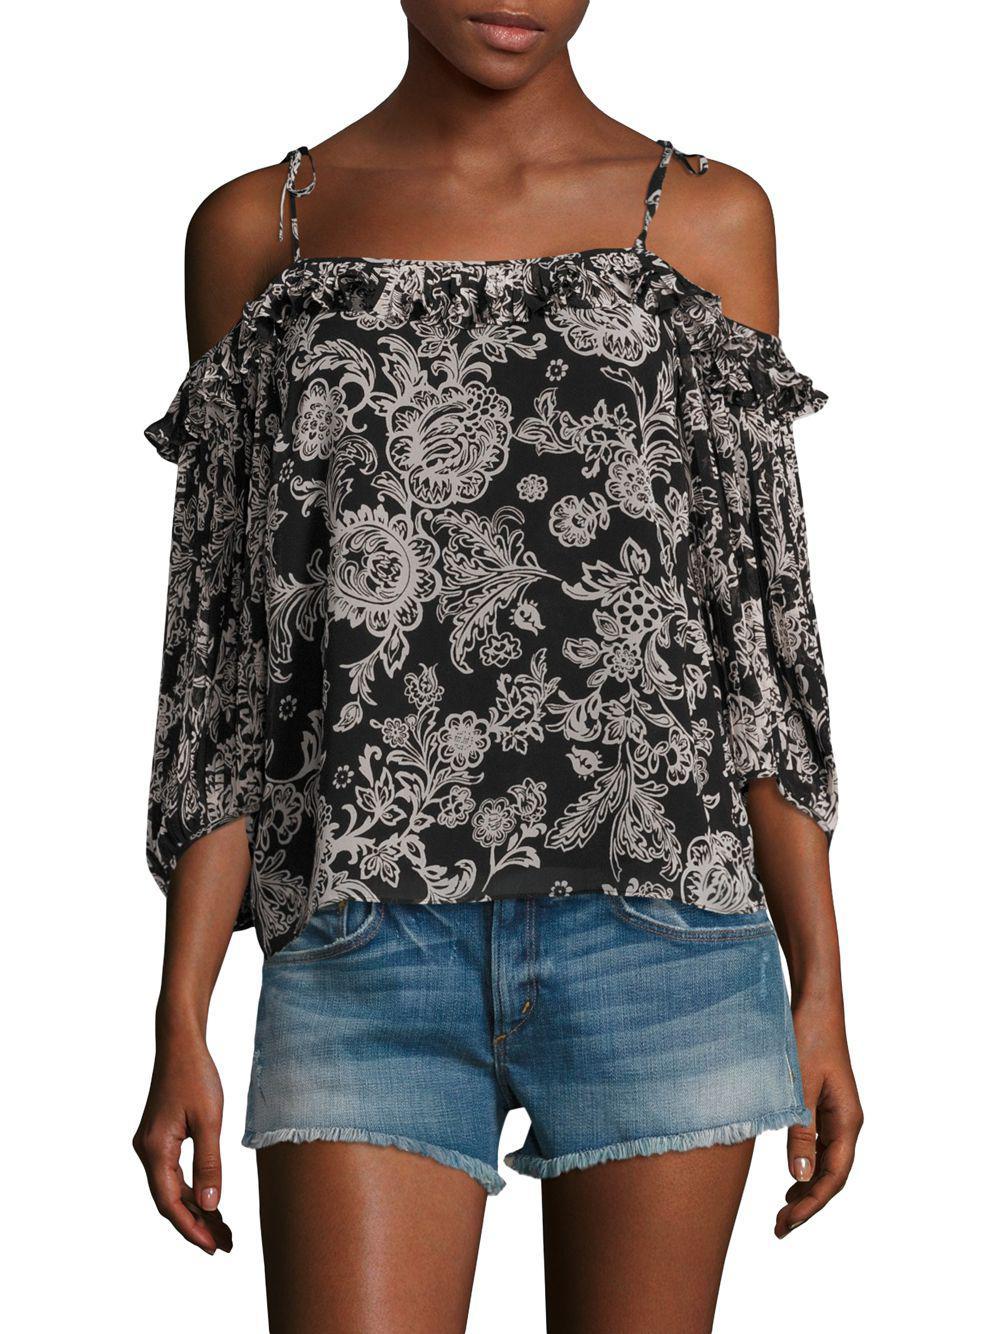 dc6ecd41fb49e5 Lyst - Ella Moss Ria Floral Cold-shoulder Top in Black - Save 42%